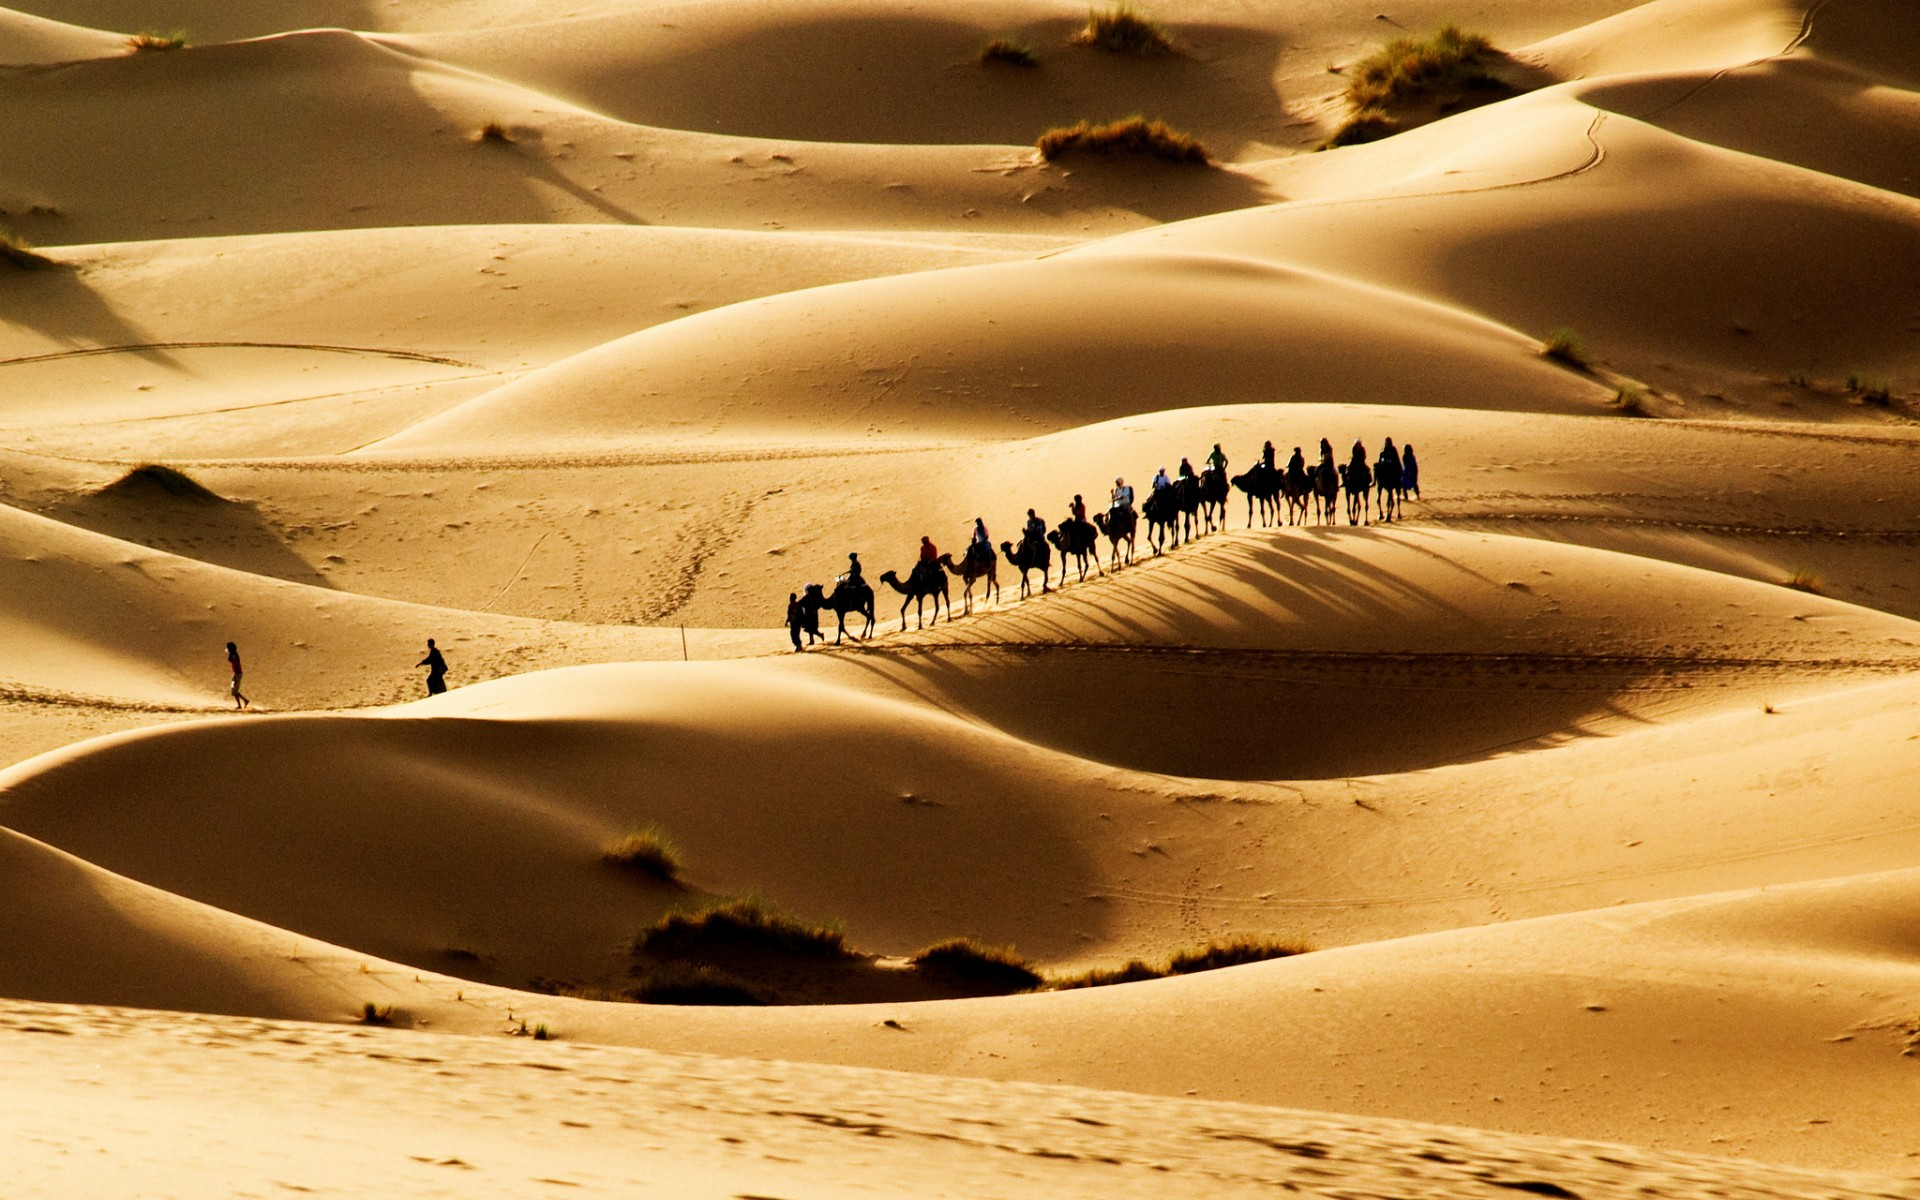 Картинки пустыни на телефон